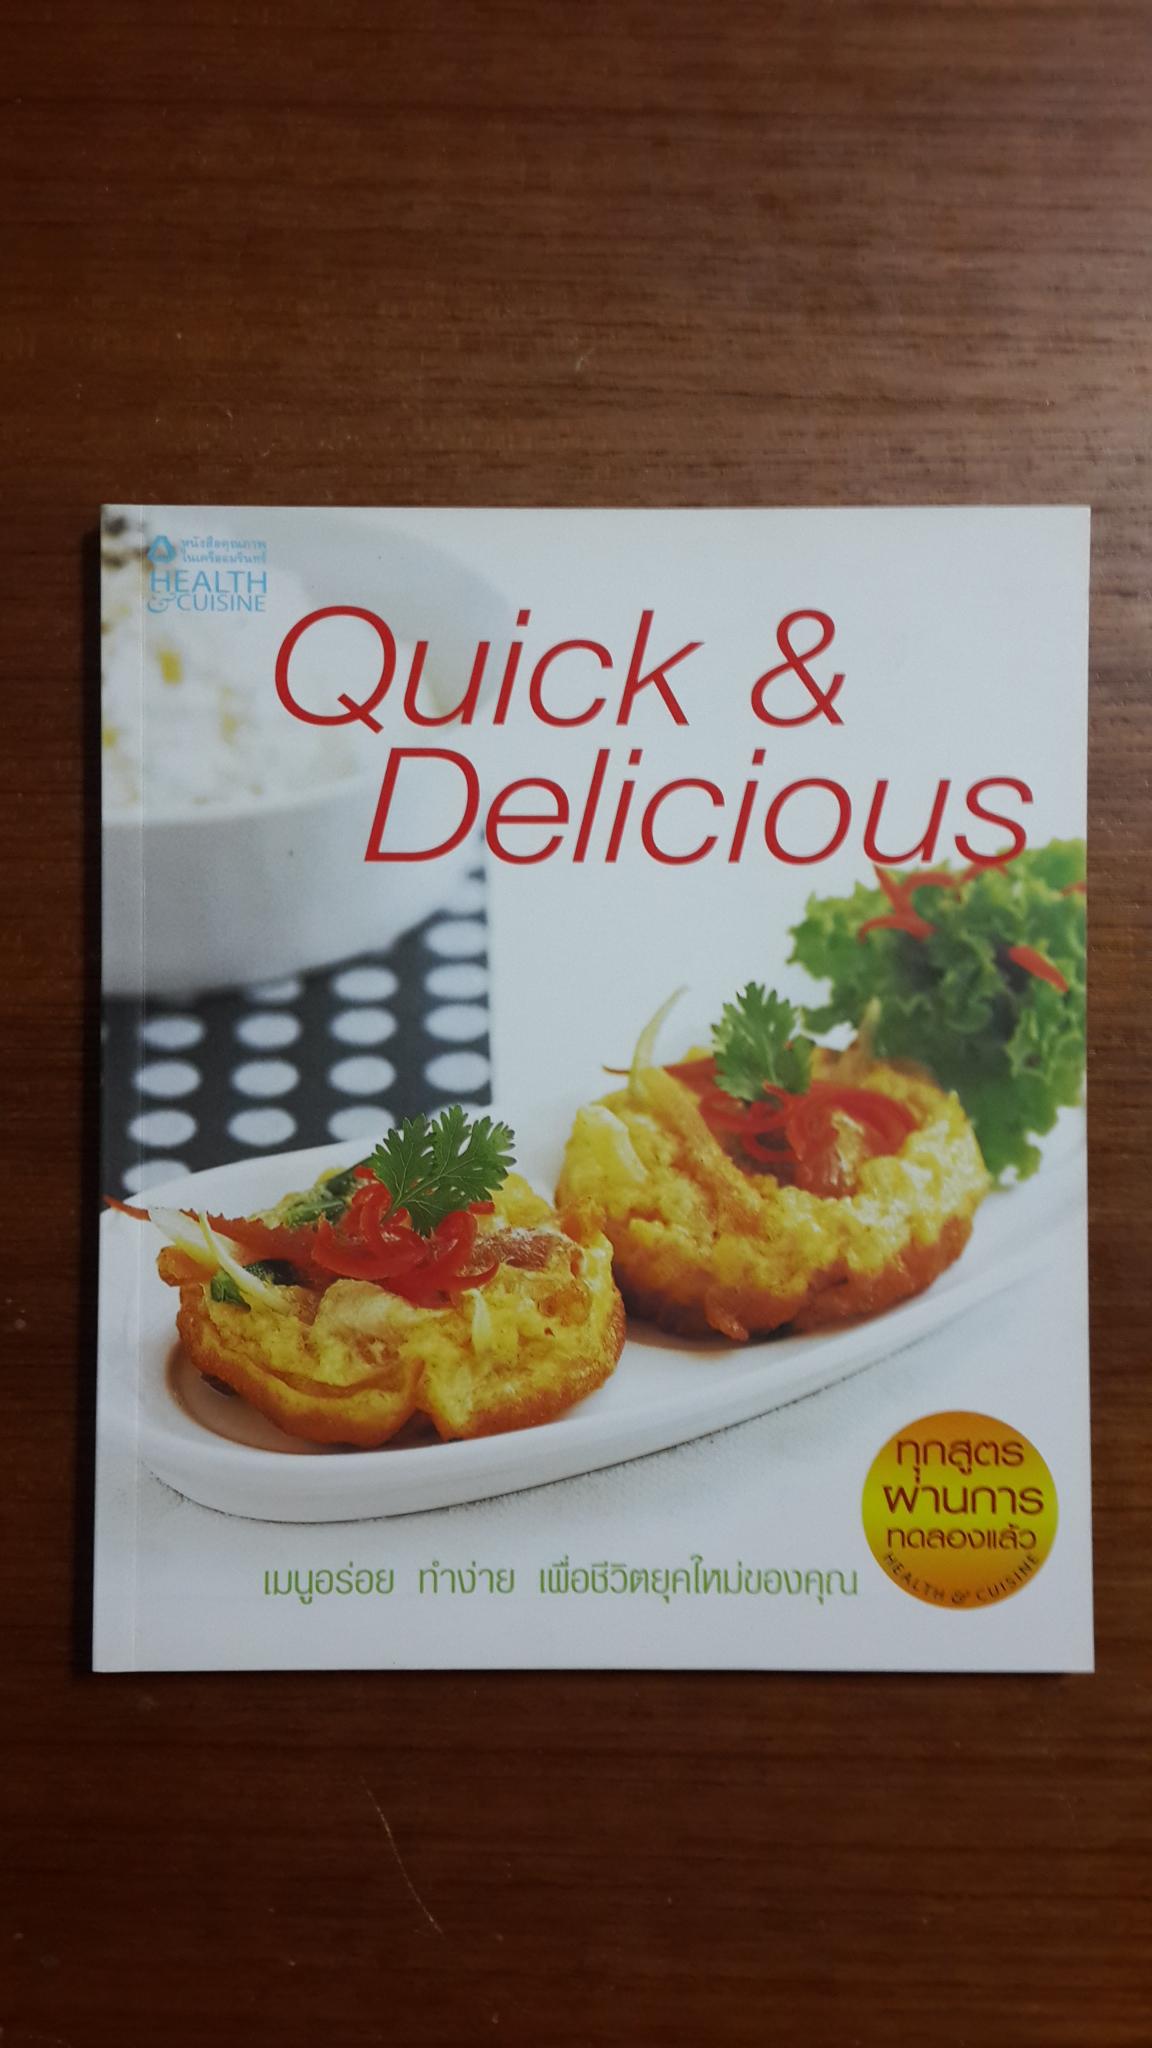 Quick & Delicious